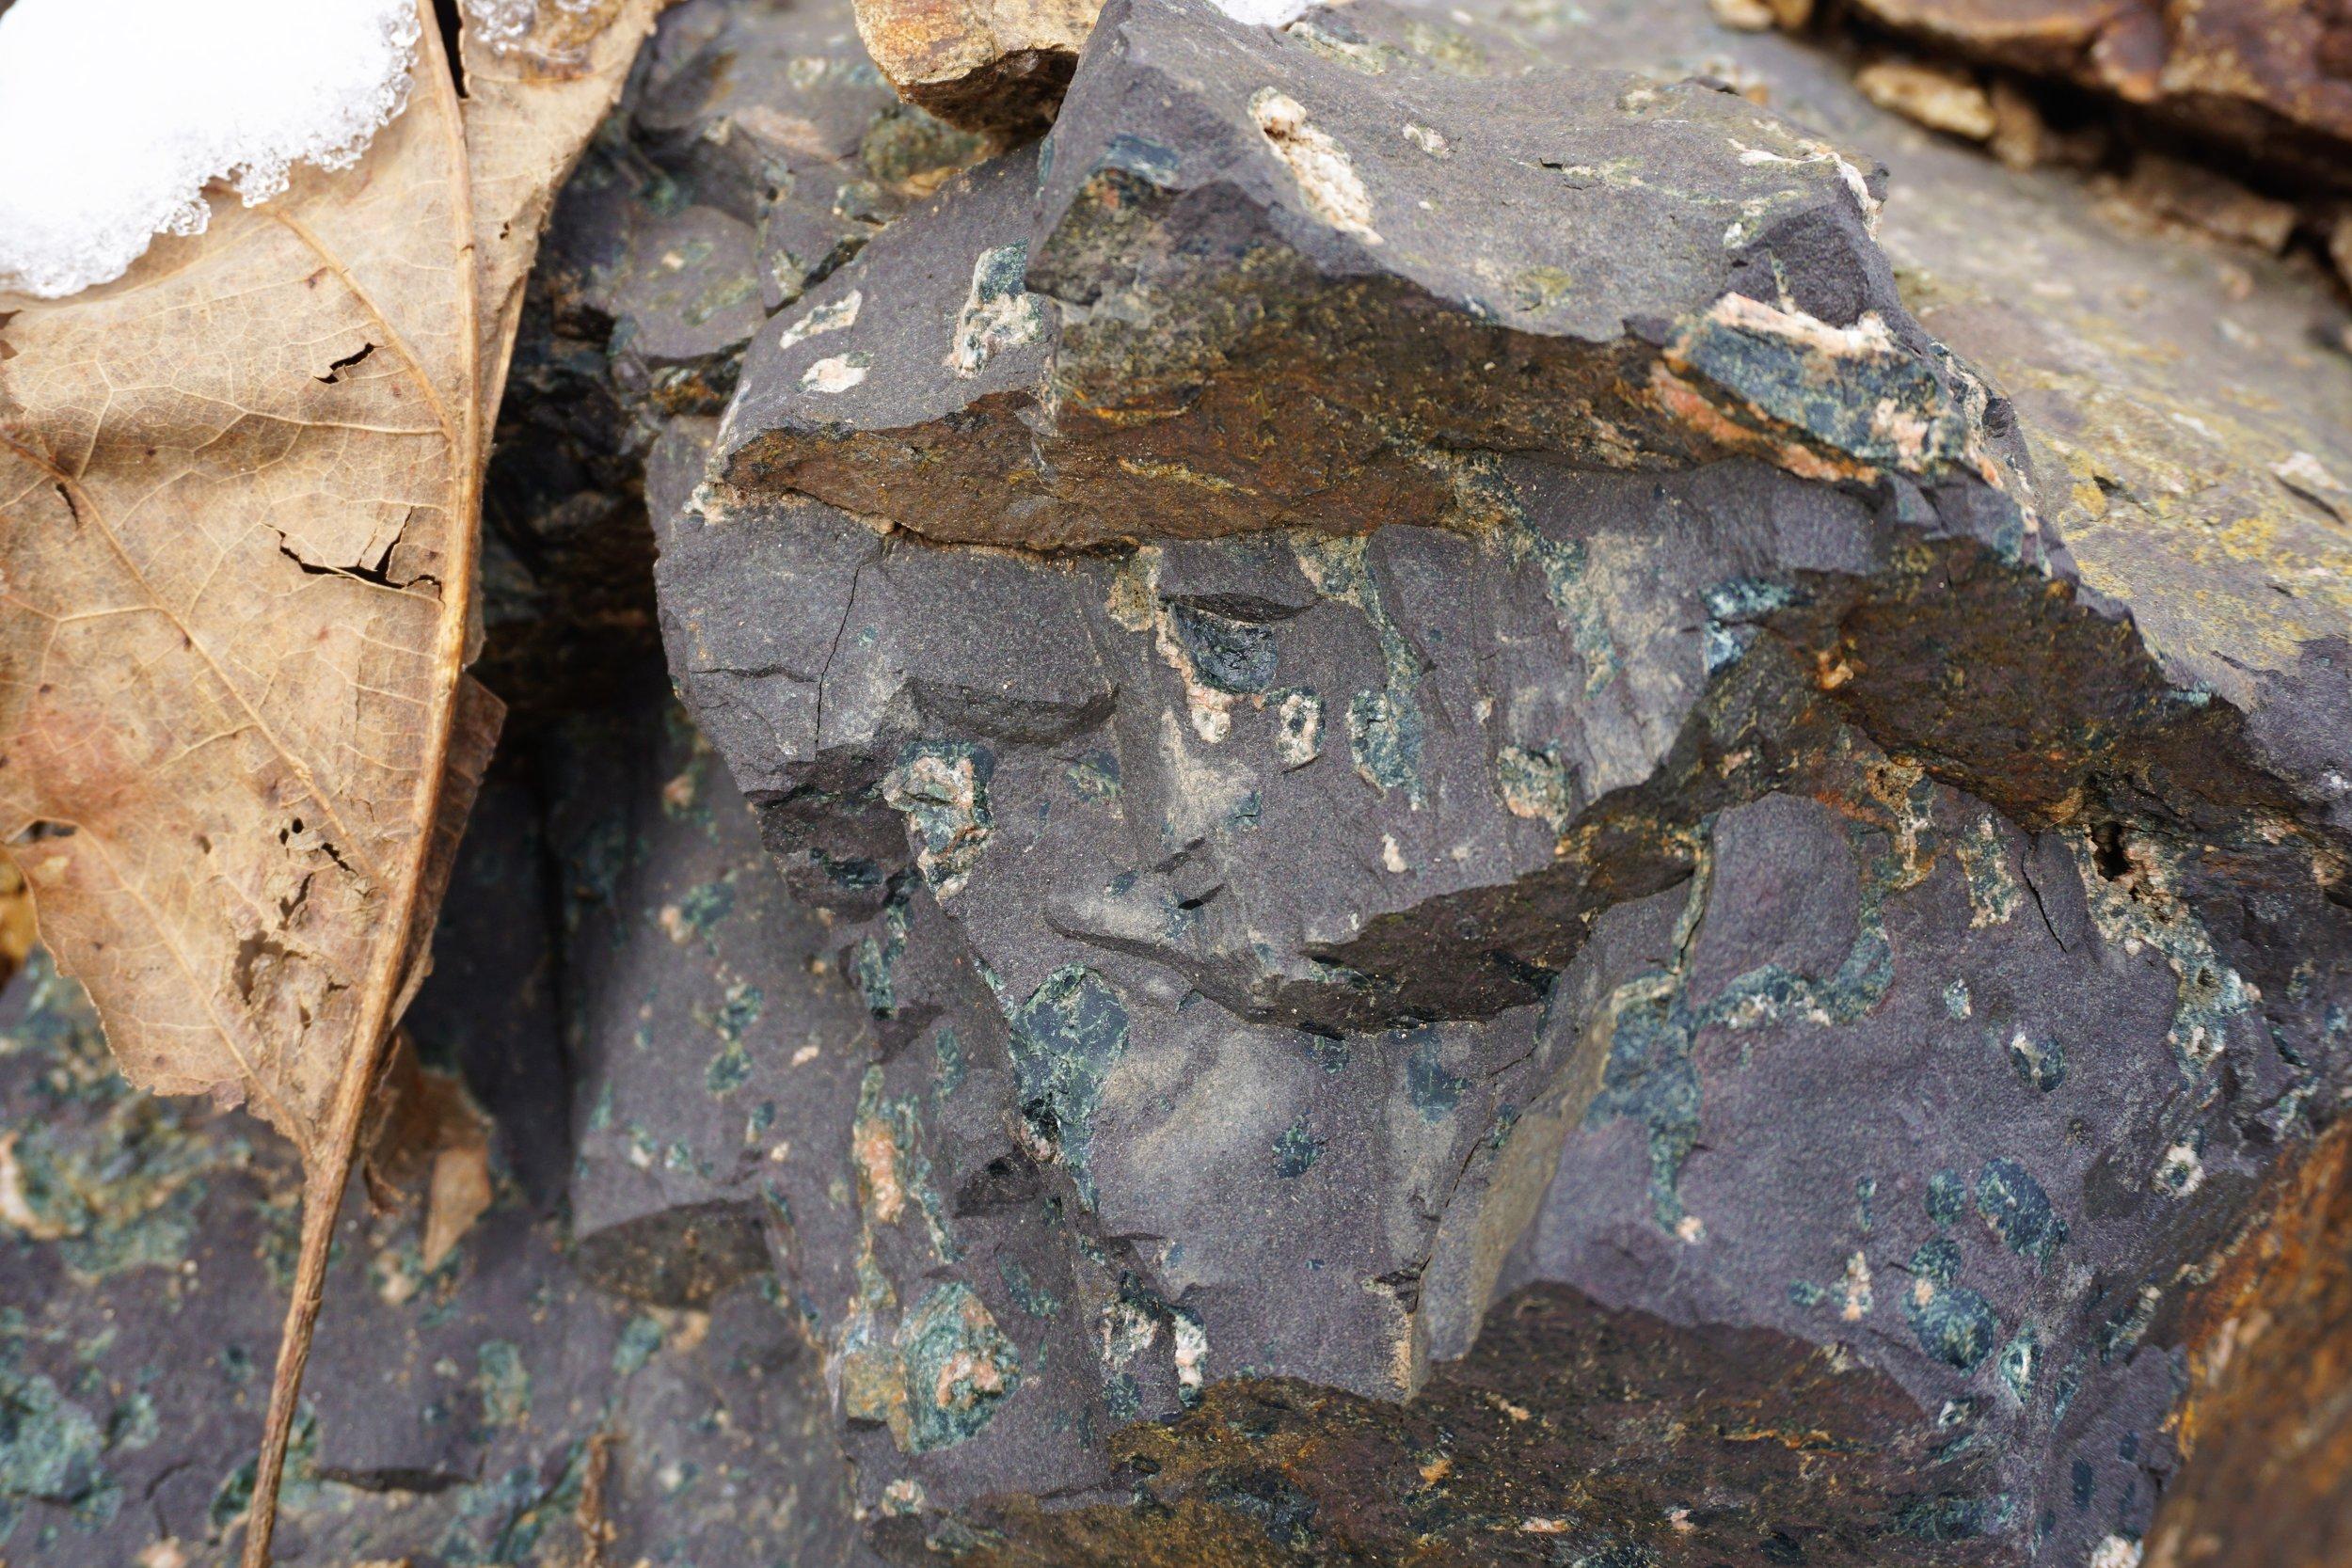 540 Ma basalt with celadonite amygdules.